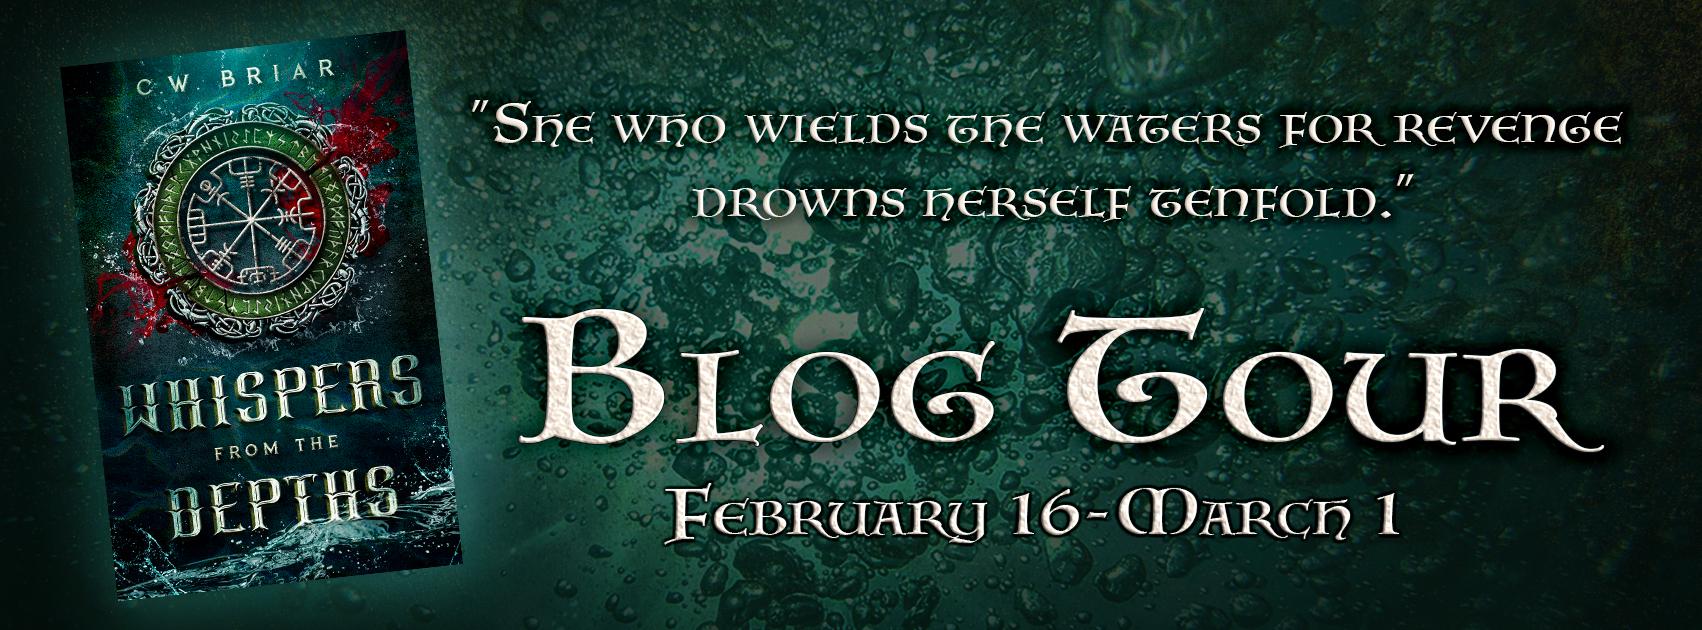 Whispers-Blog-Tour